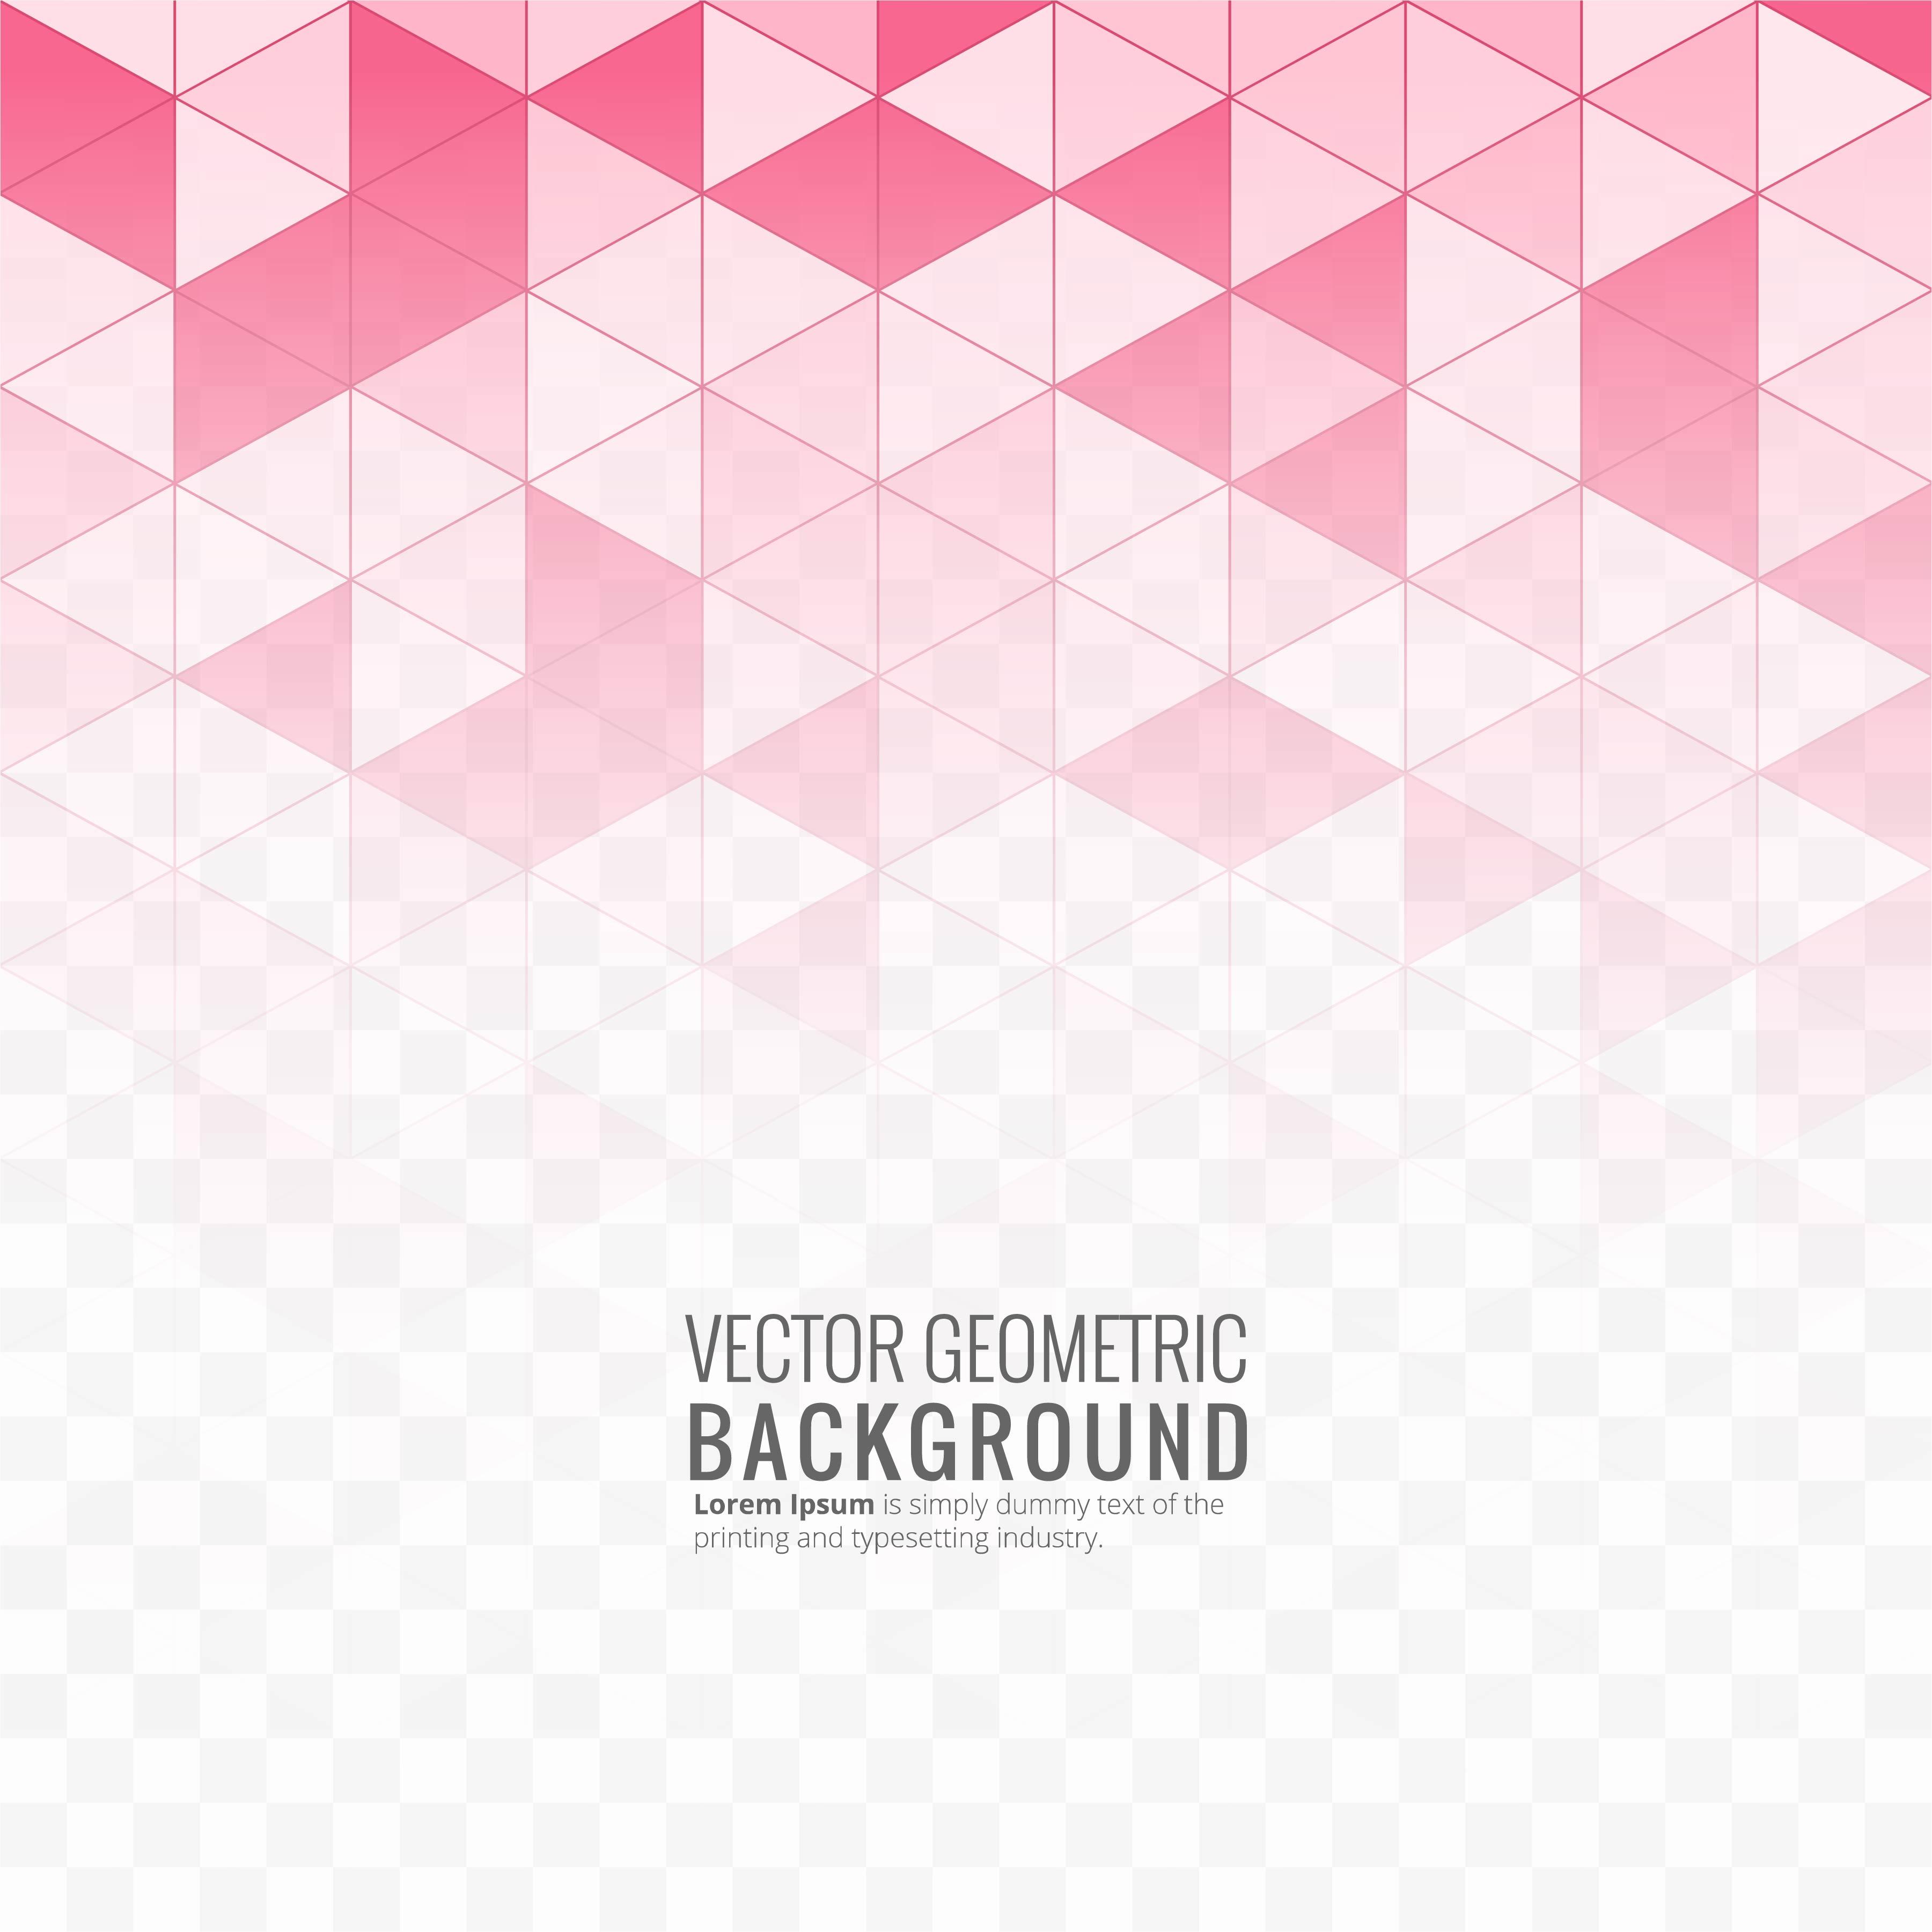 Vector Illustration Web Designs: Beautiful Pink Geometric Background Illustration